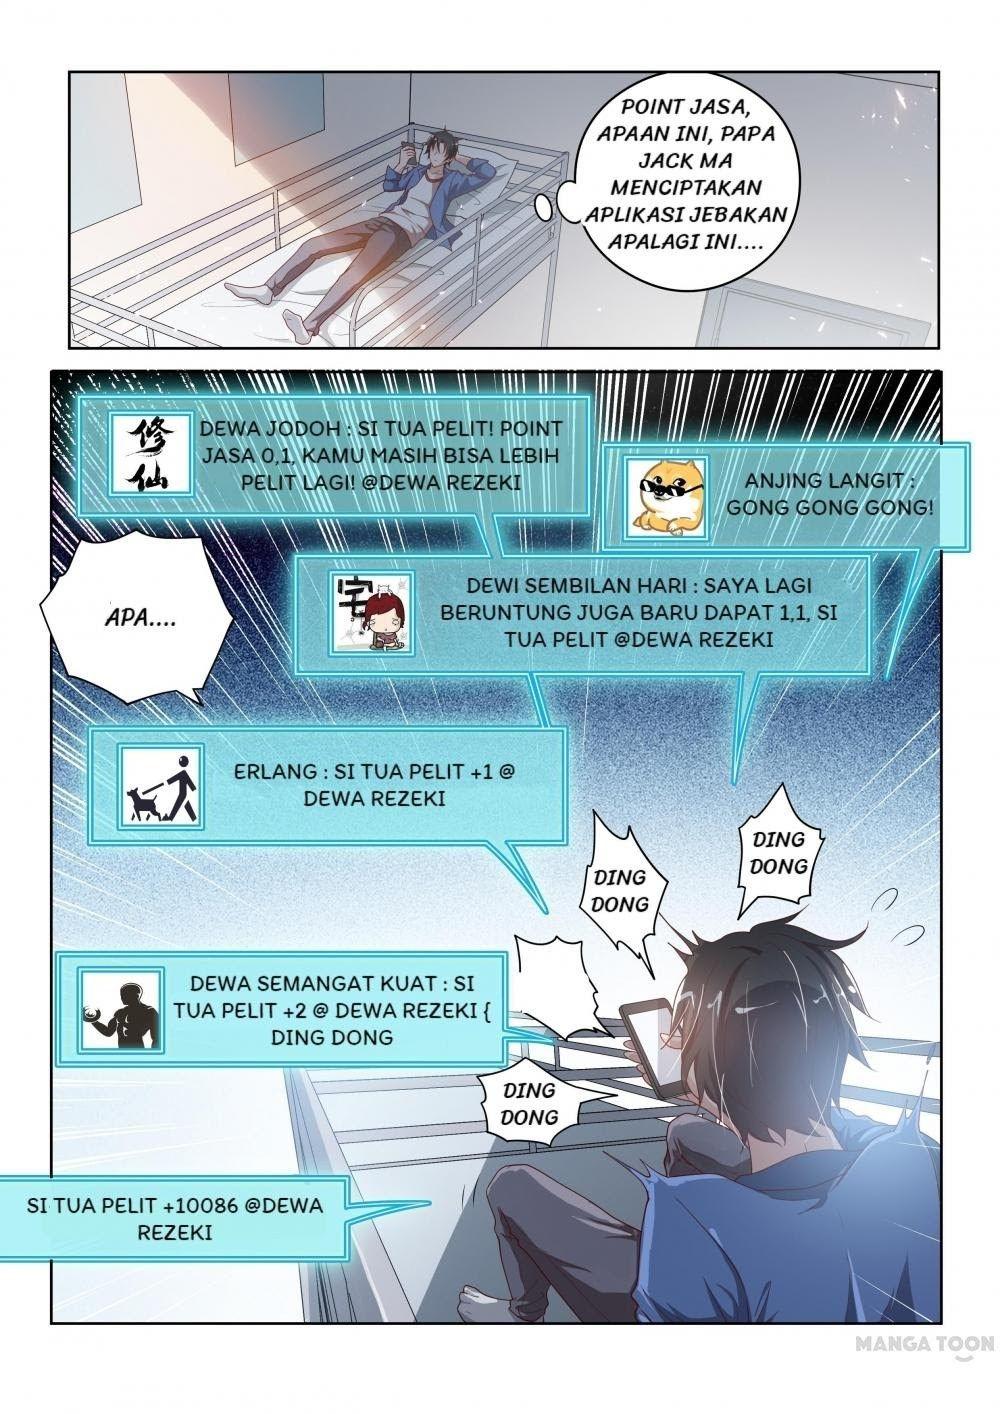 My Amazing Wechat Chapter 1 Bahasa Indonesia Klikmanga Bahasa Indonesia Anjing Komik